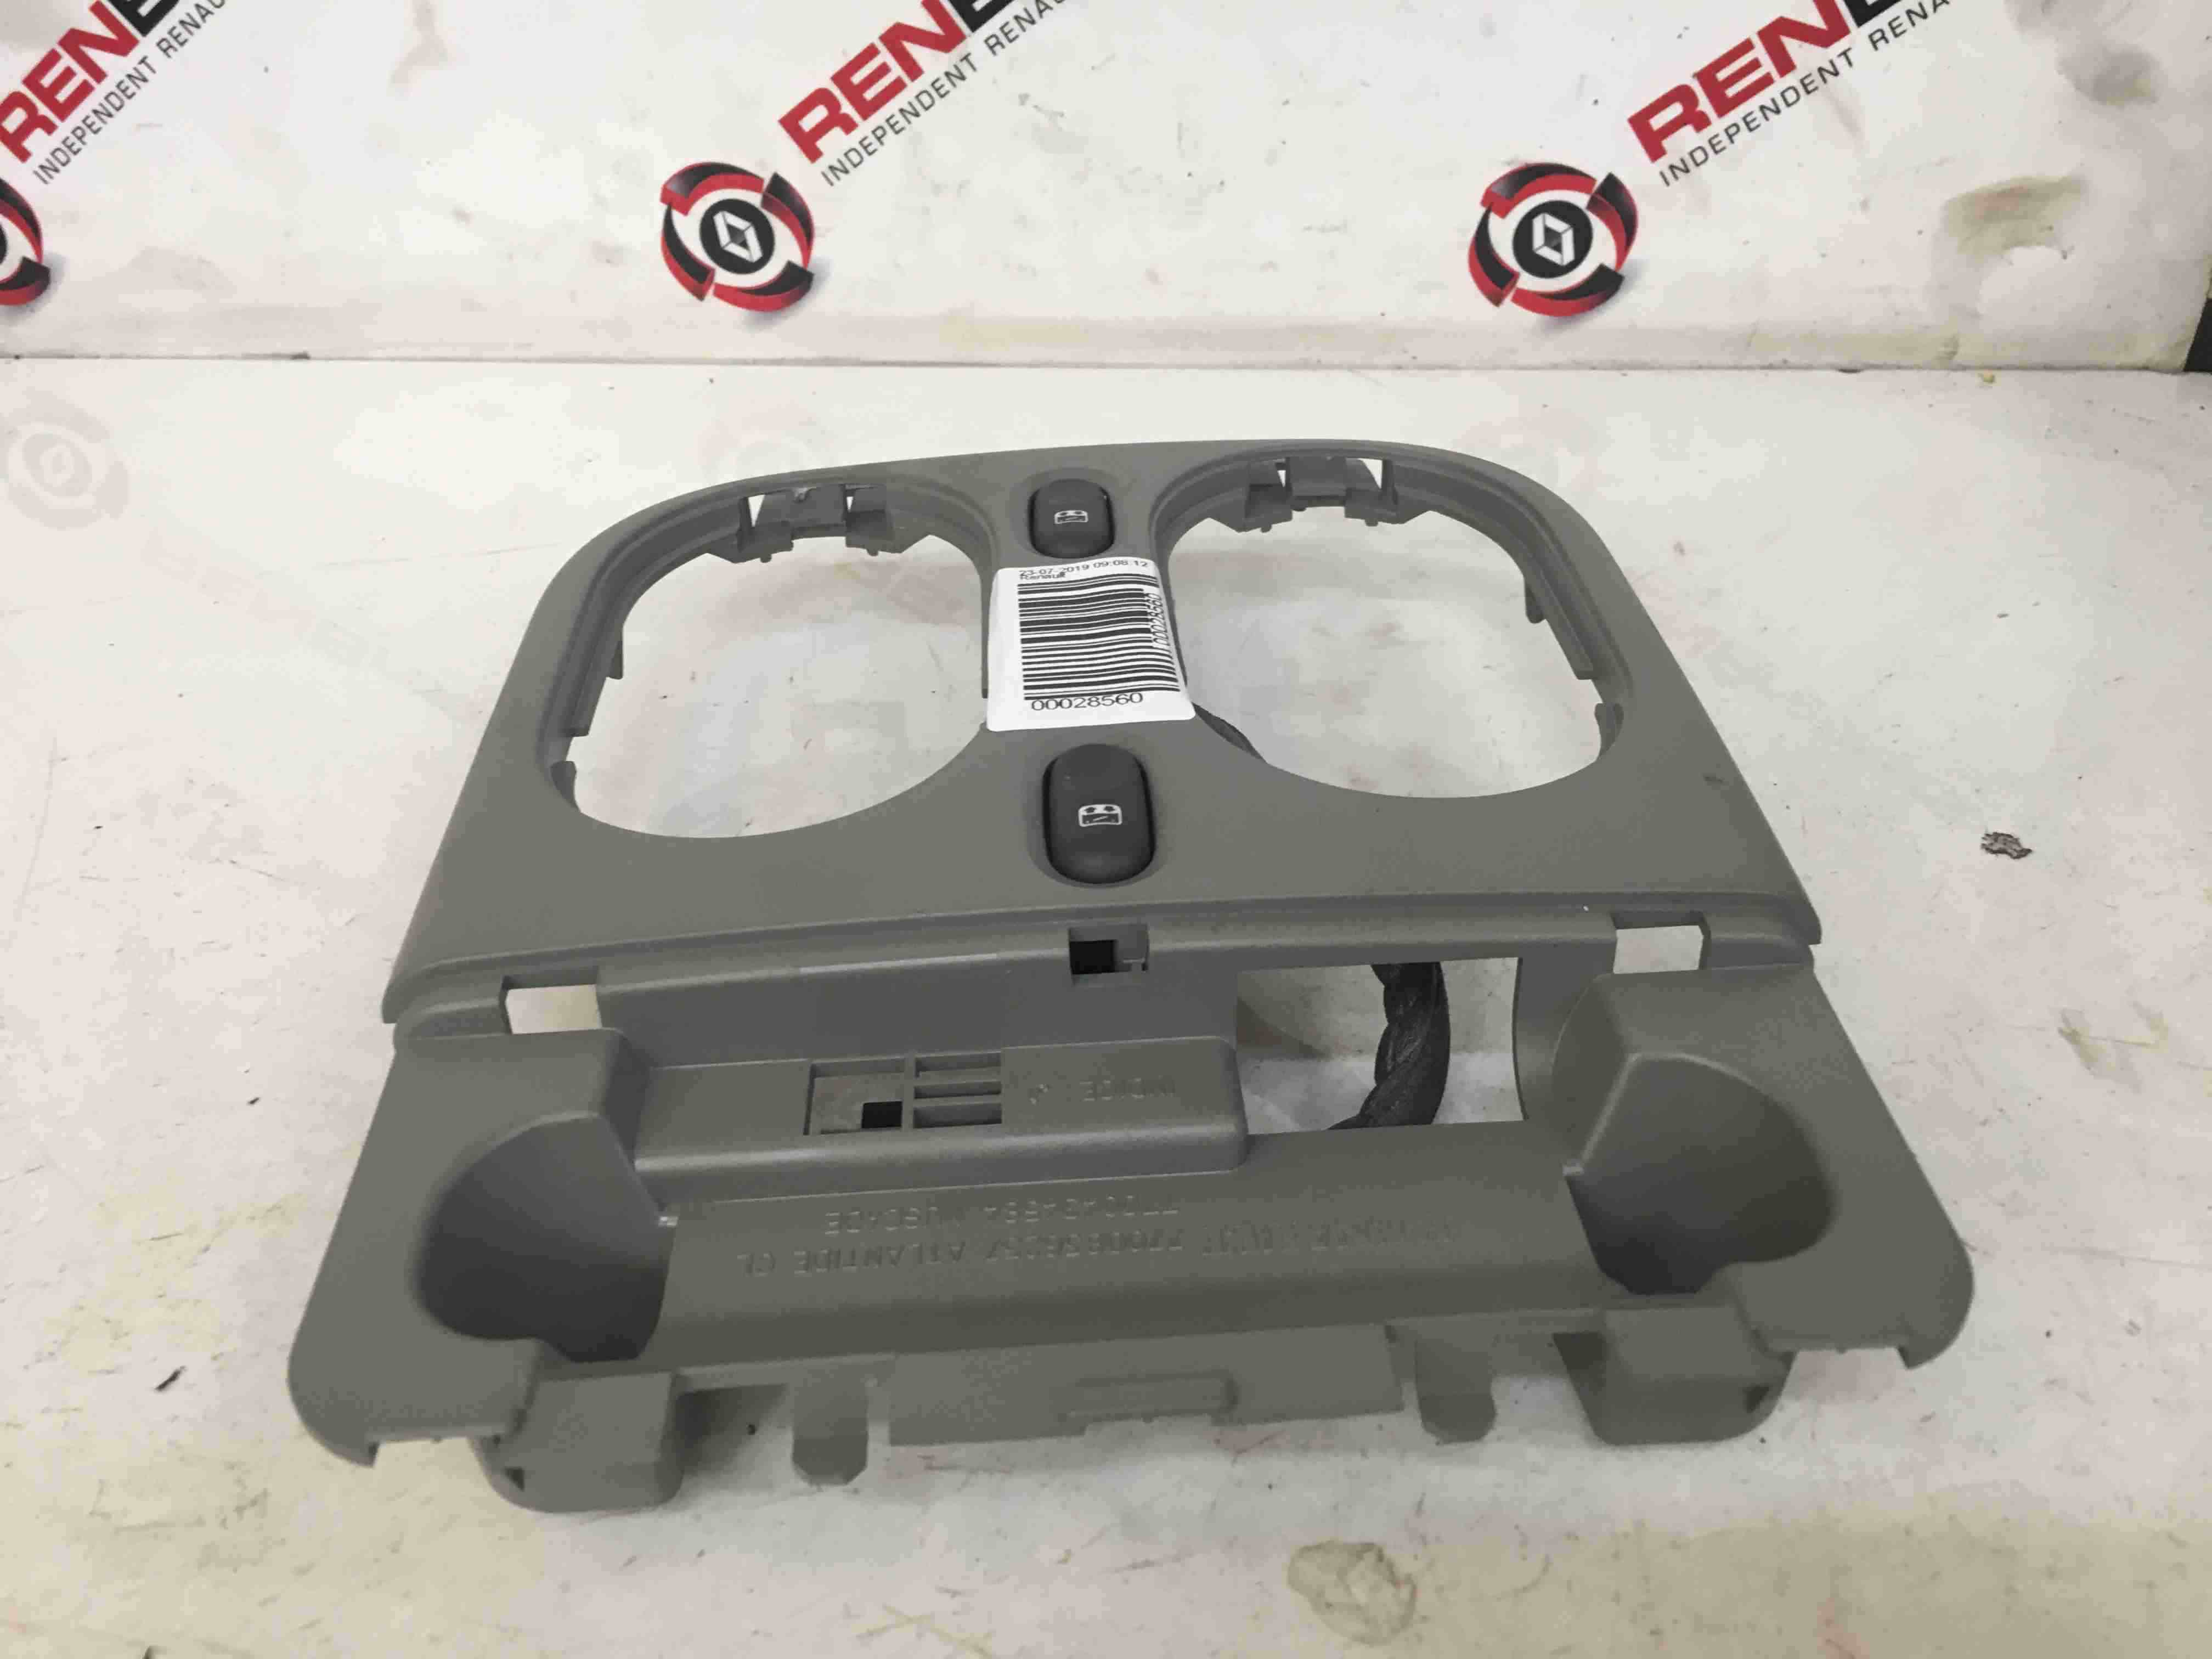 Renault Scenic MK1 1999-2003 Interior Roof Light Surround Switches Light Grey